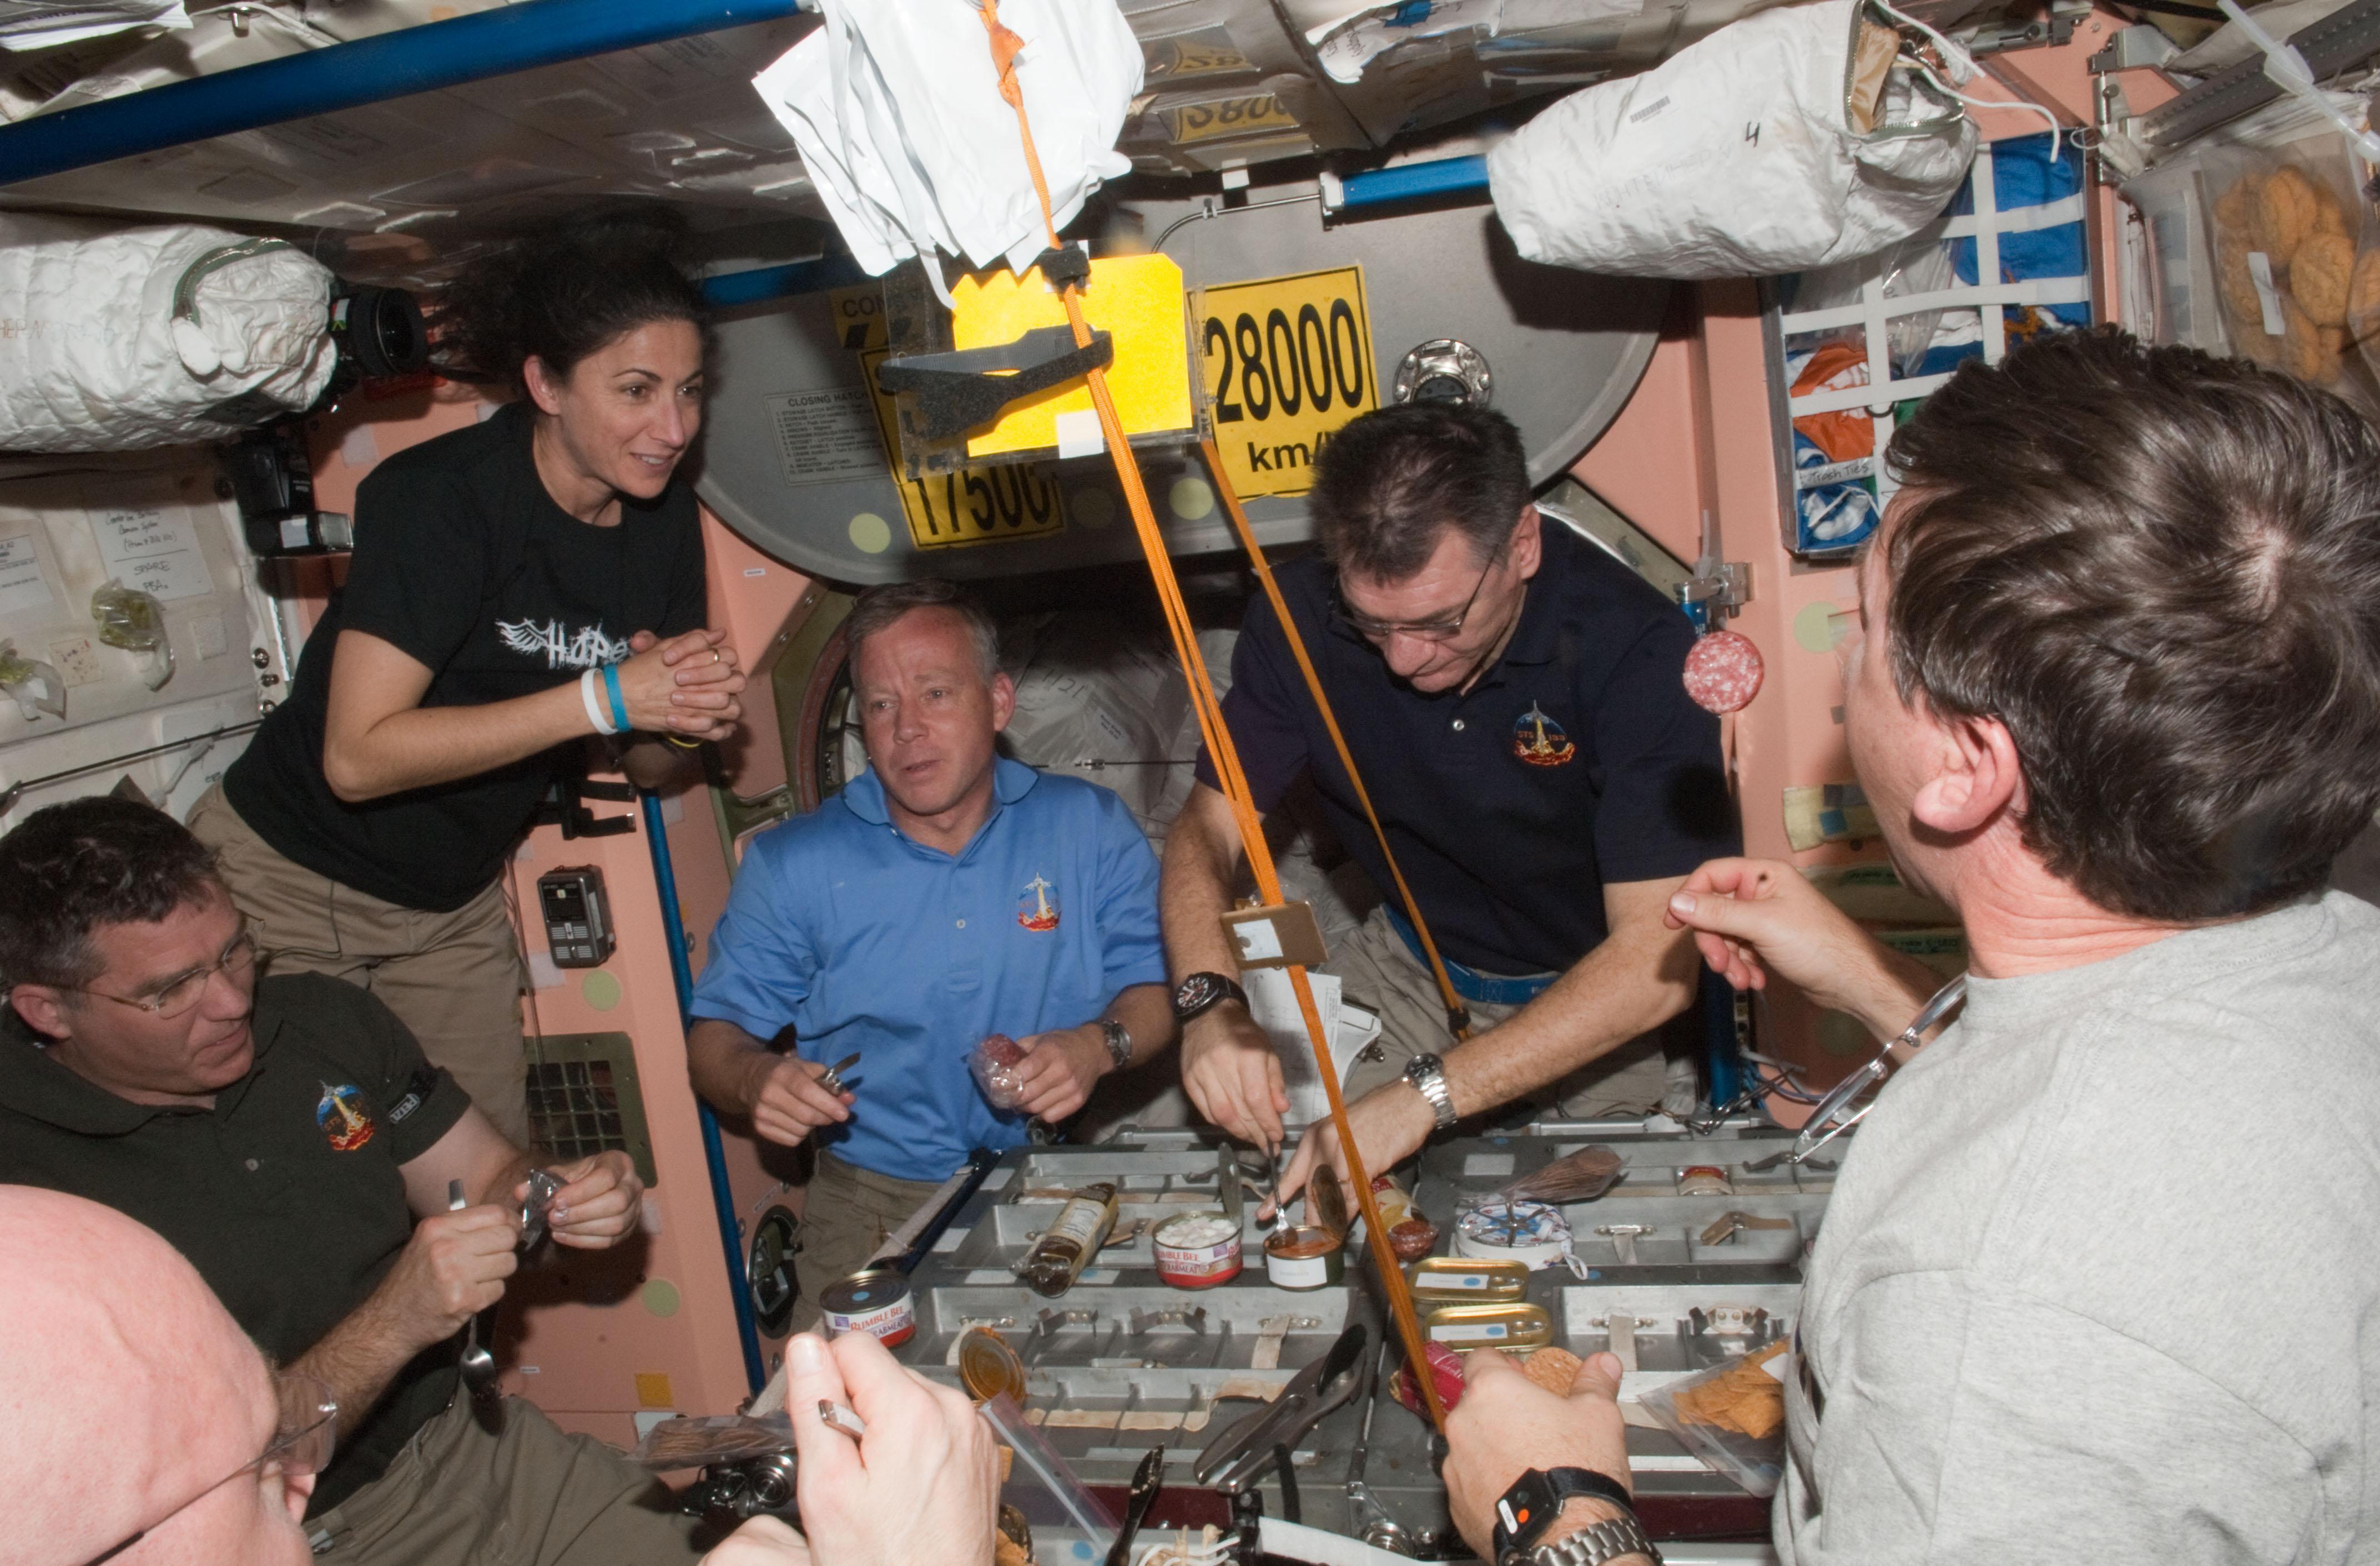 nasa food for astronauts - 1200×627